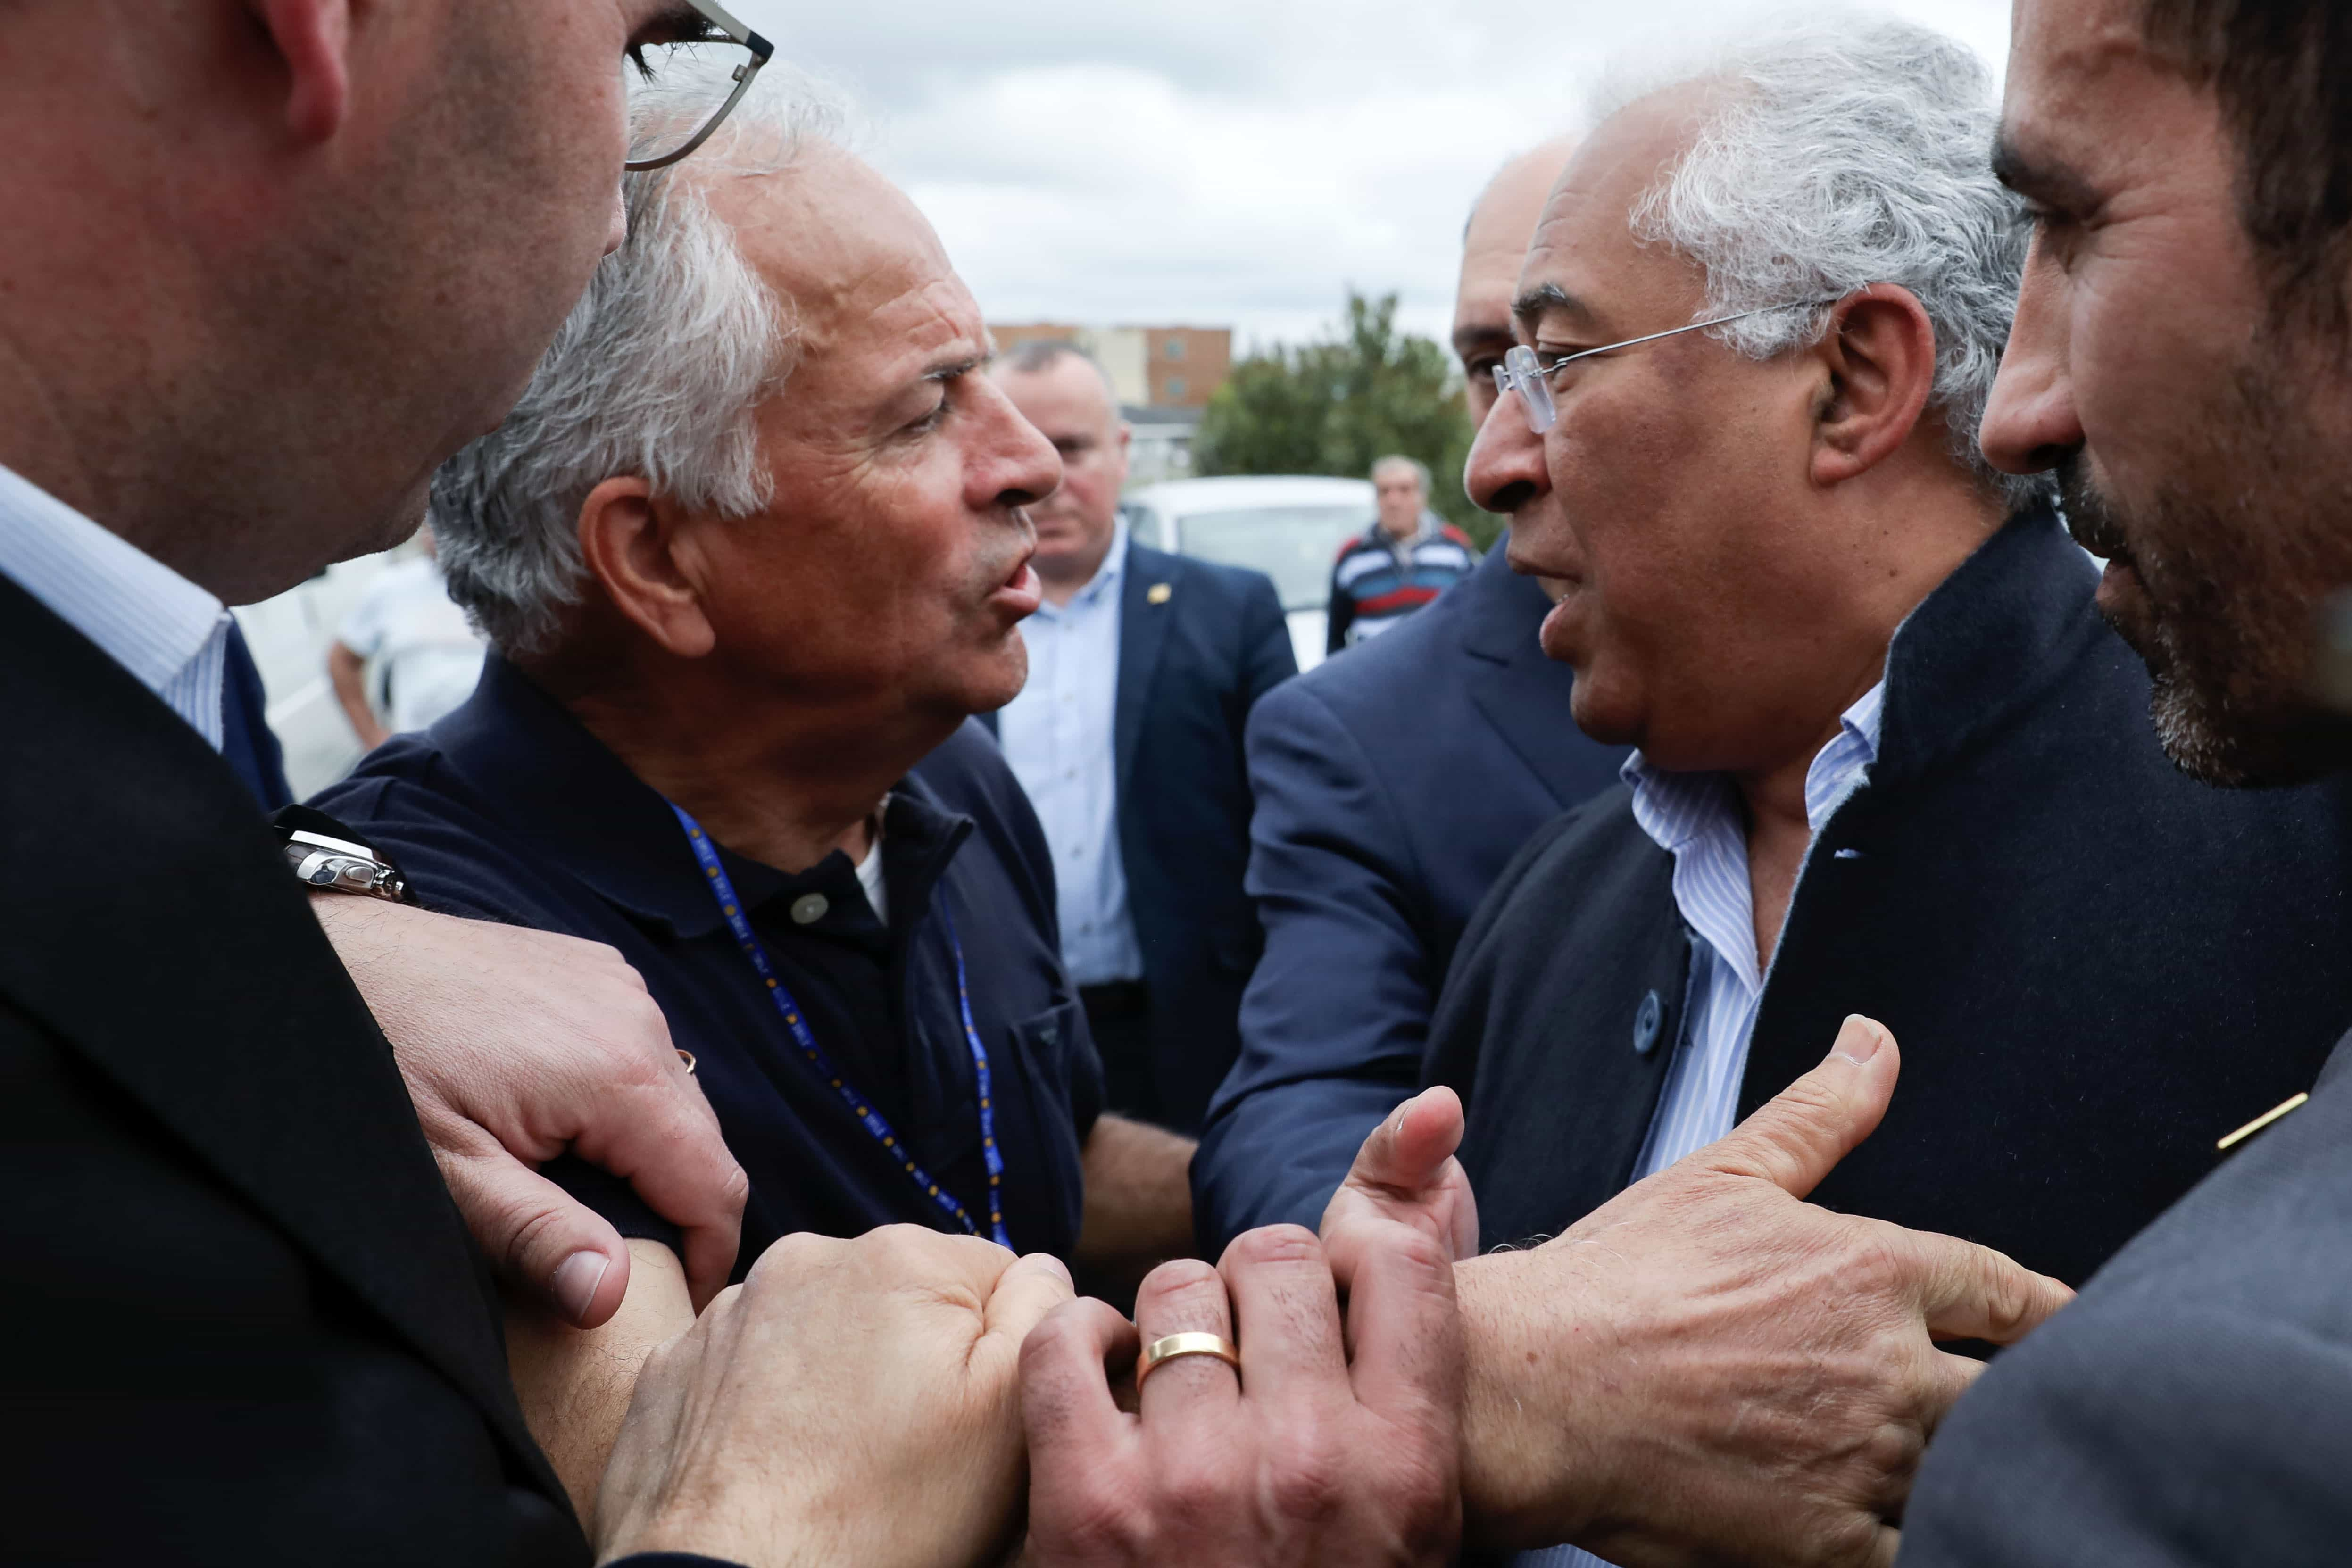 António Costa recebido em Gaia por protesto ruidoso dos lesados do BES